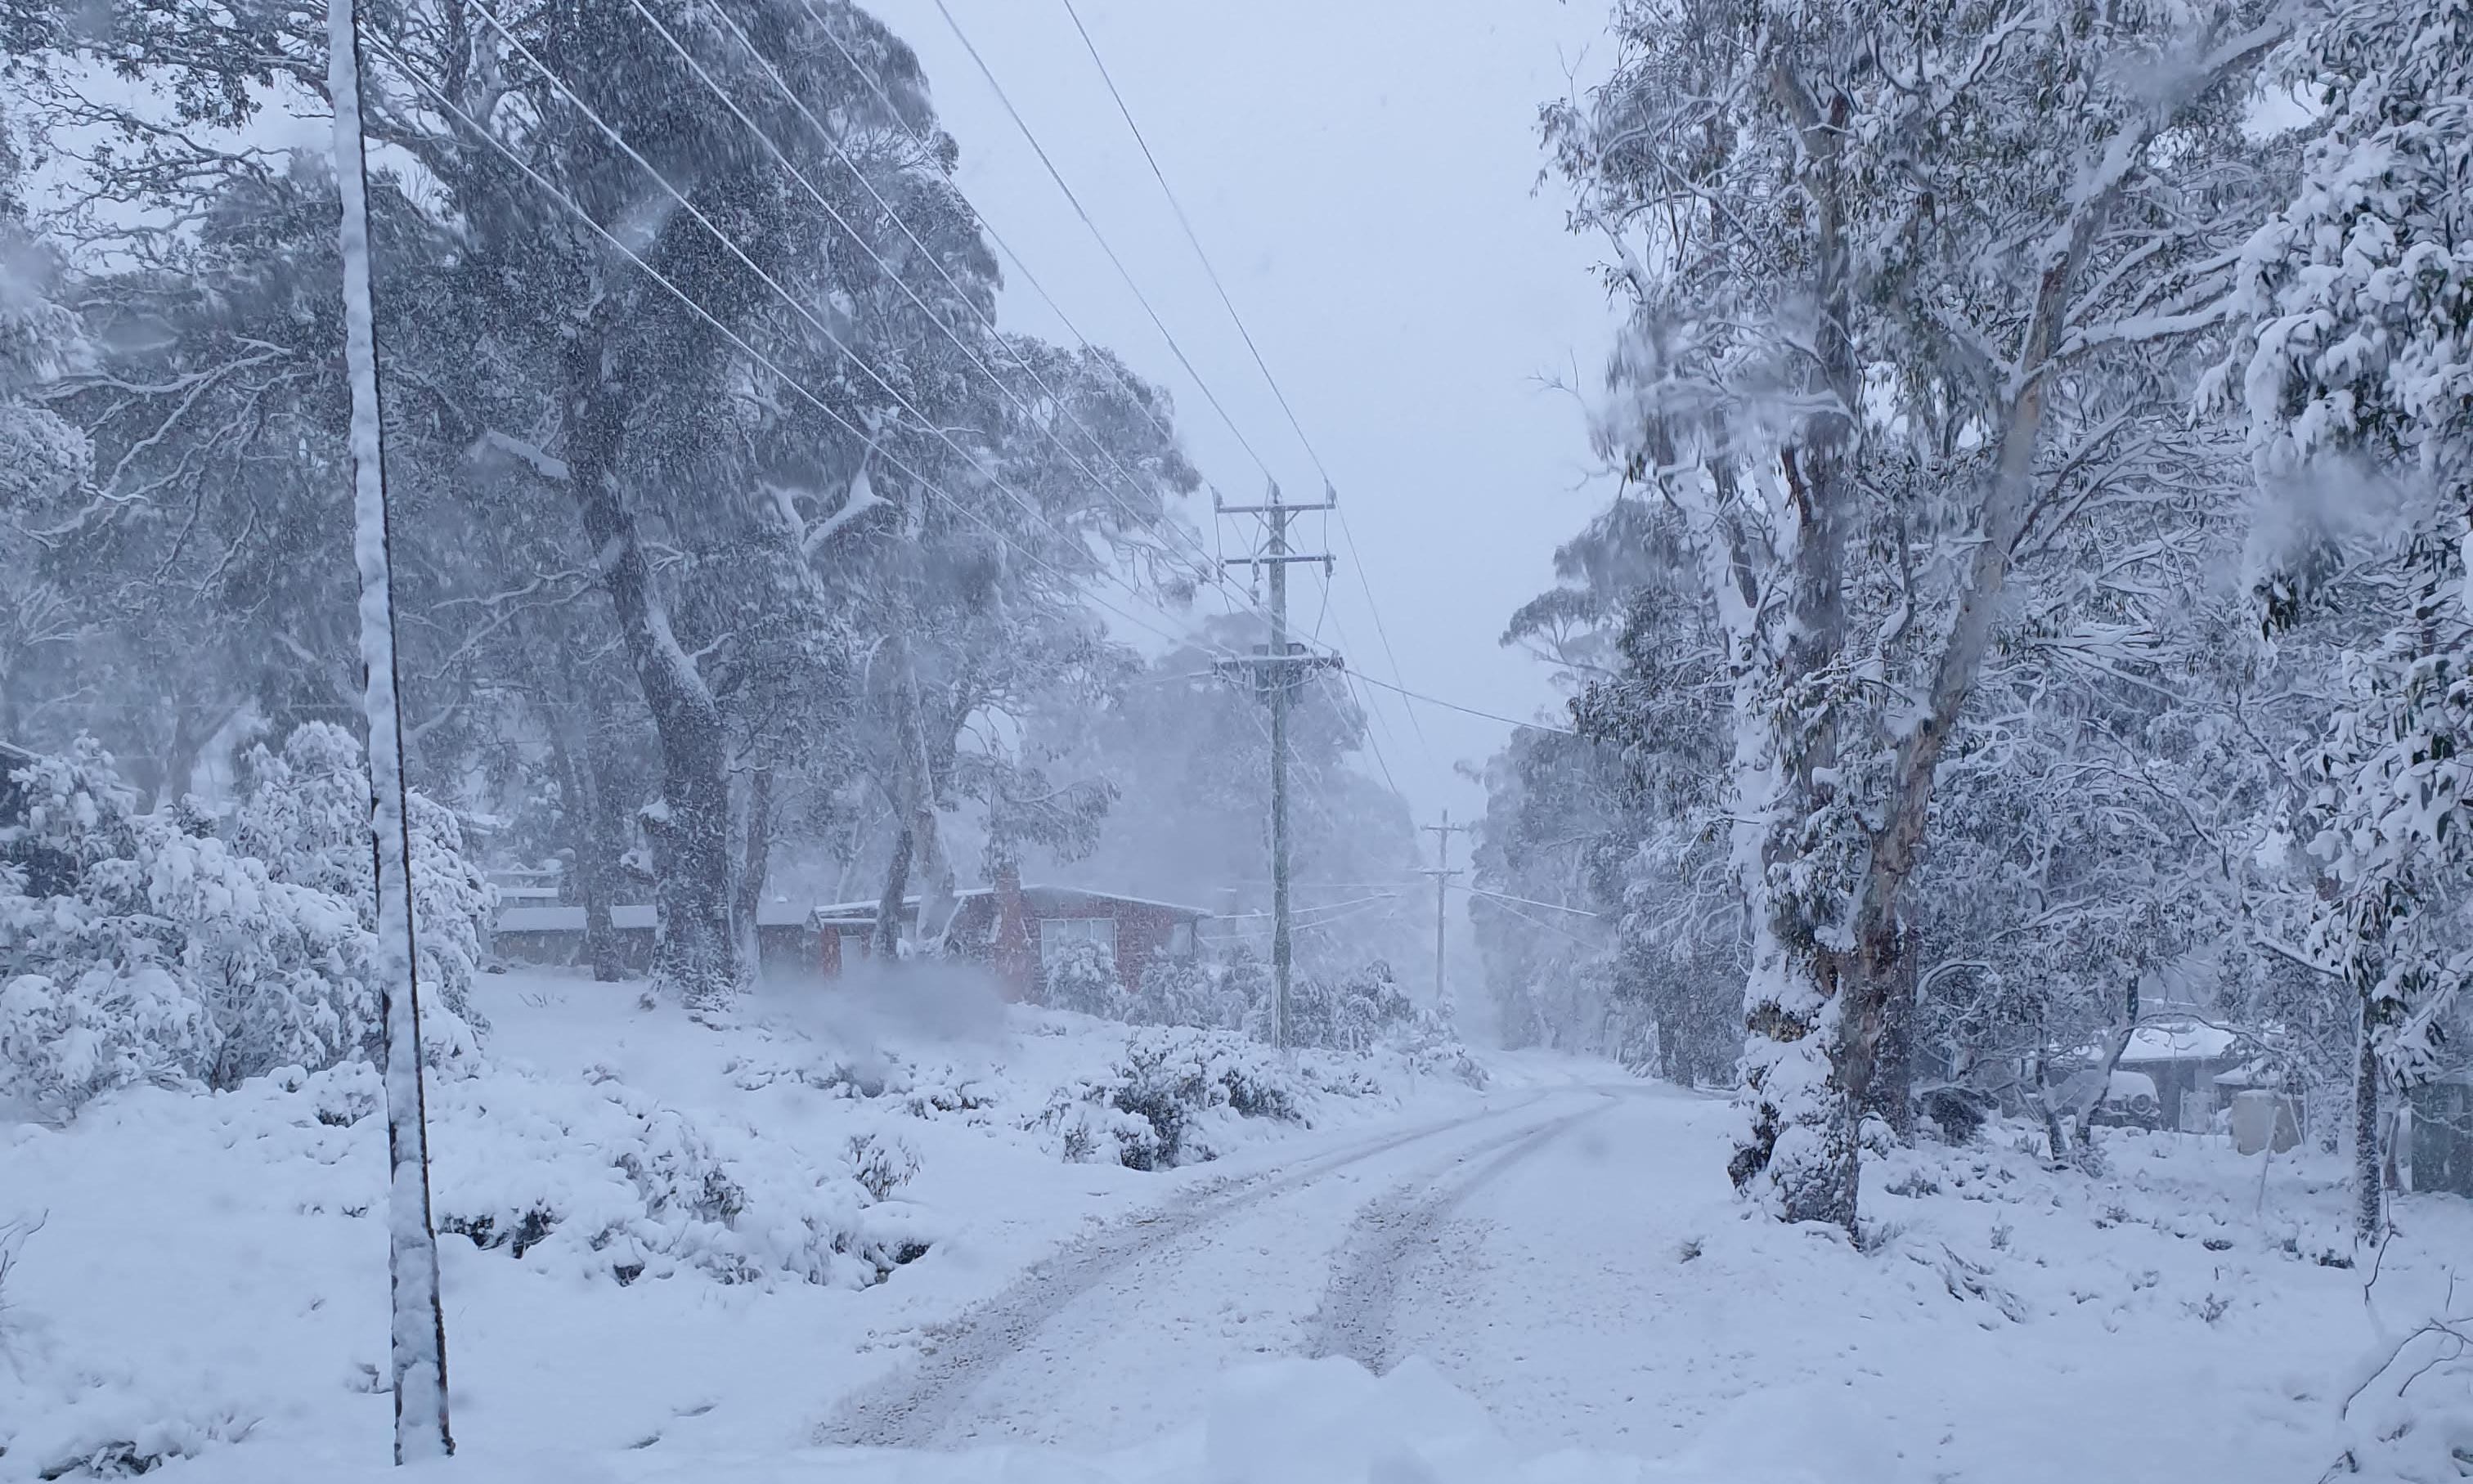 Spring snow blankets parts of Tasmania a week after bushfires raged